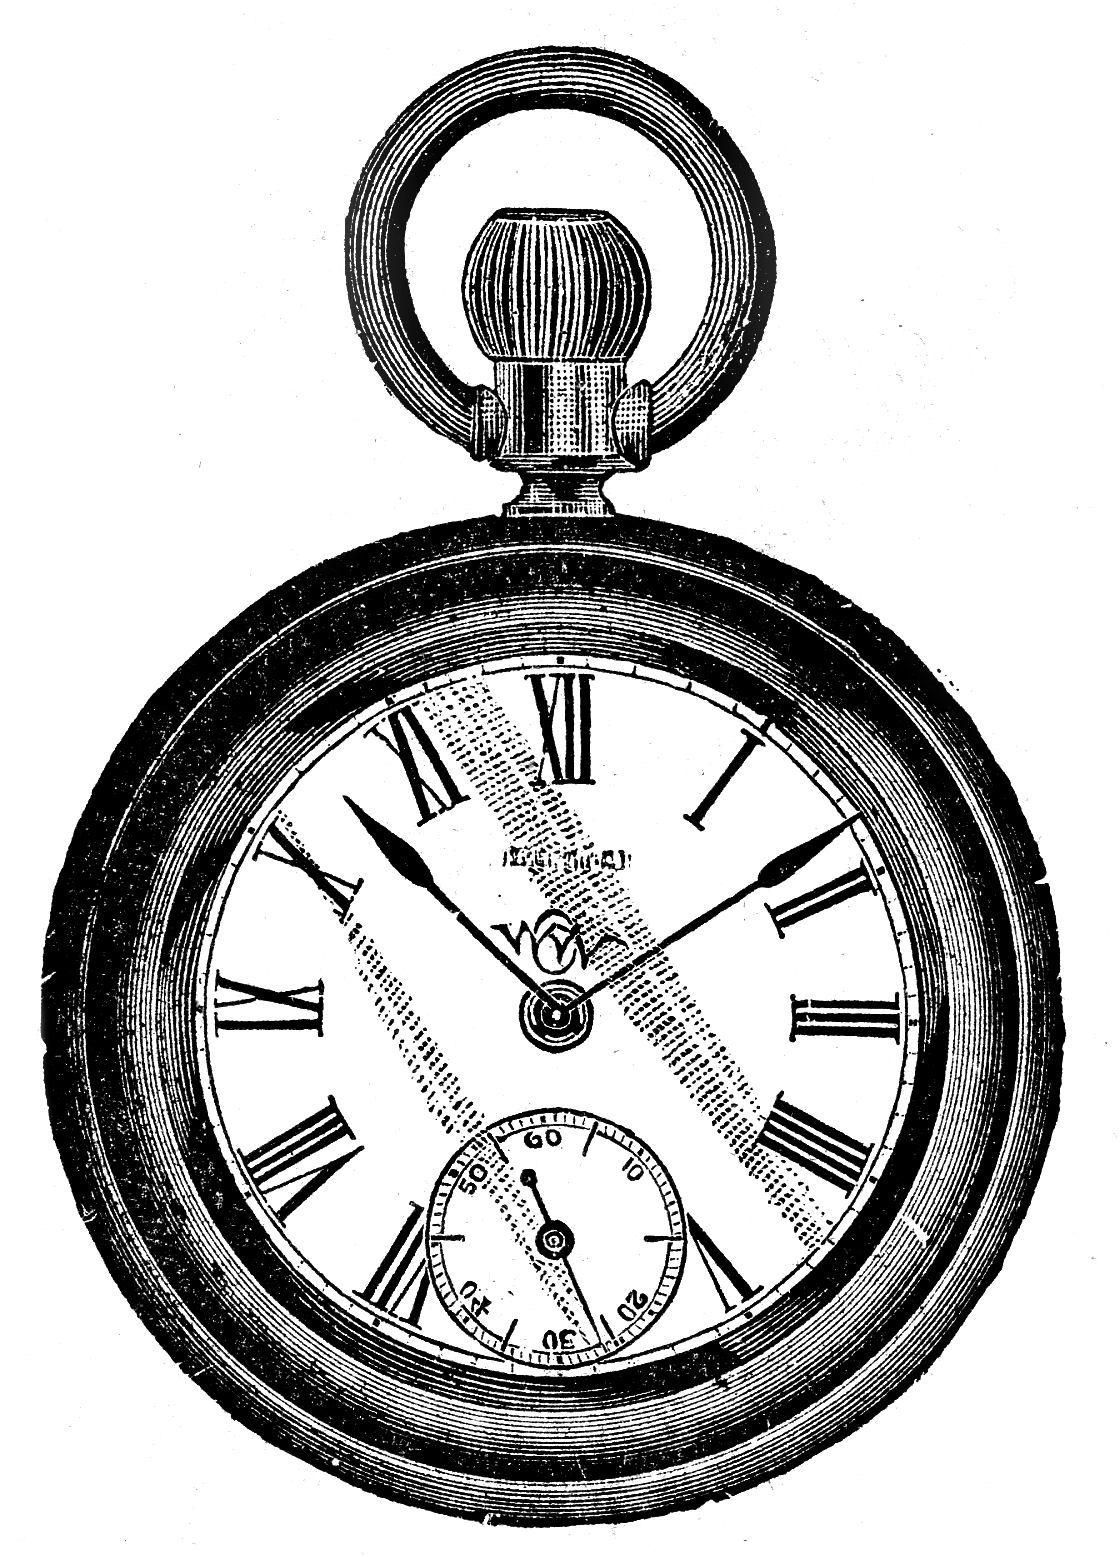 Vintage Clip Art - Antique Pocket Watch | 이상한 나라의 앨리스, 회중 ...